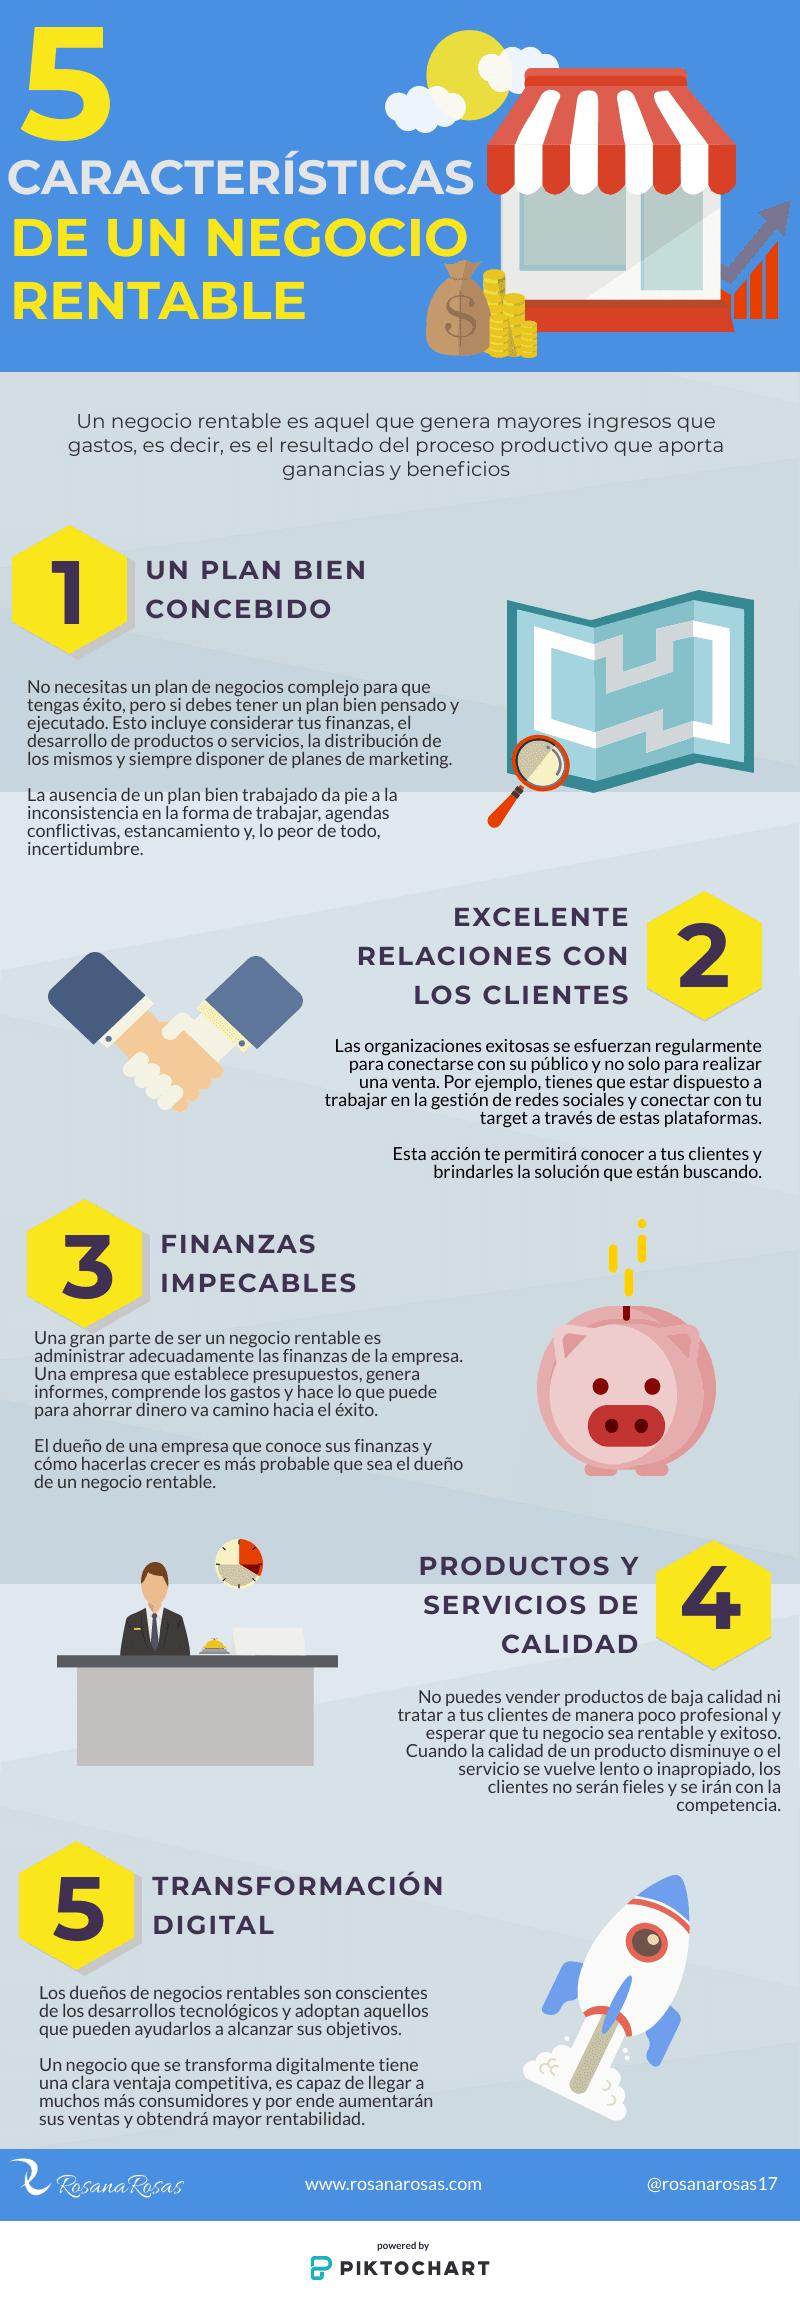 Infografia caracteristicas de negocio rentable